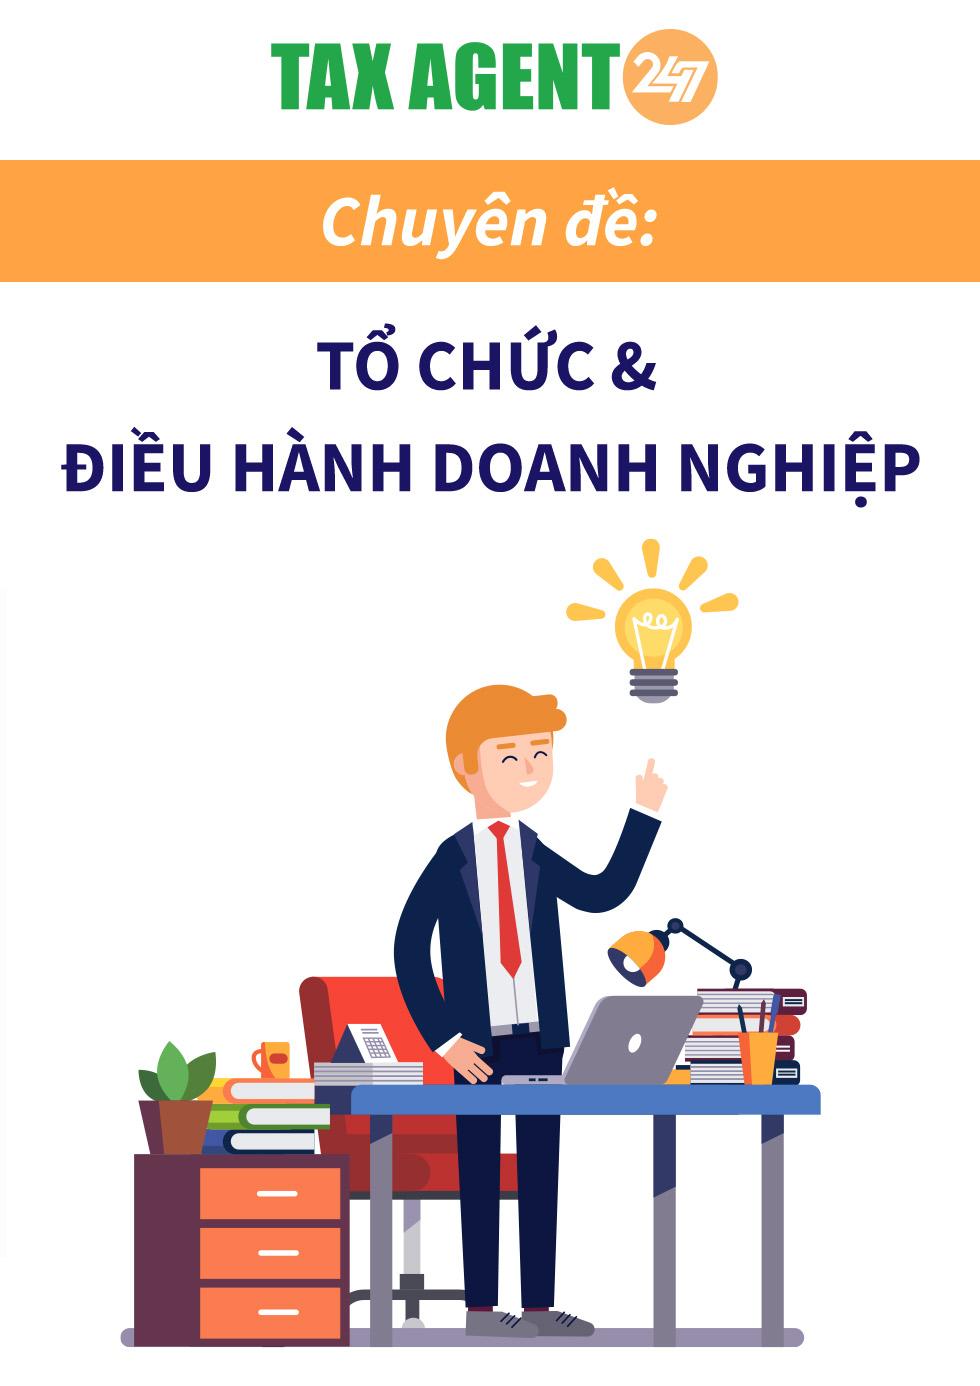 TO-CHUC-1